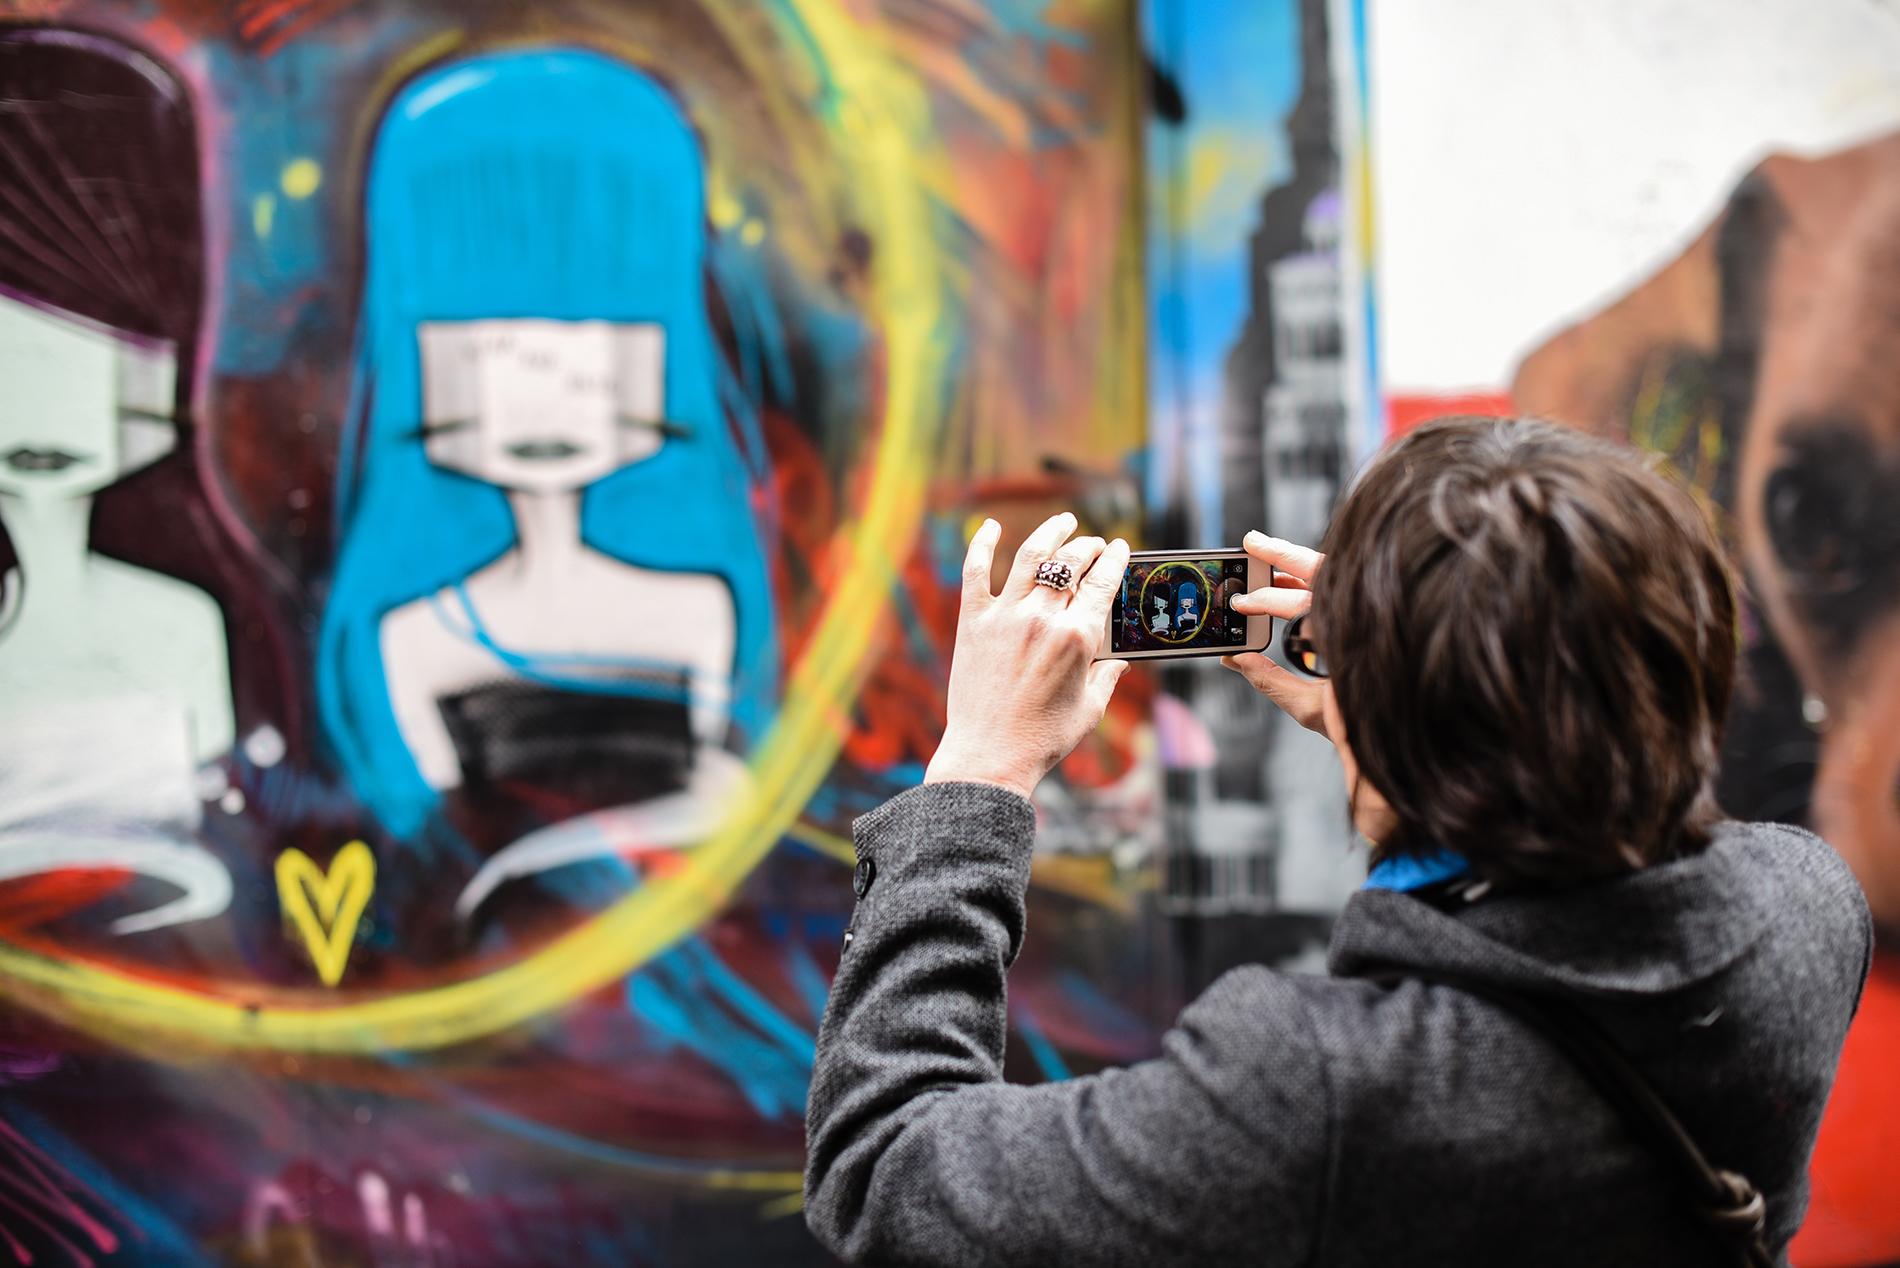 Paula Abrahão | BLOG - Projeto 6 on 6 - Dublin